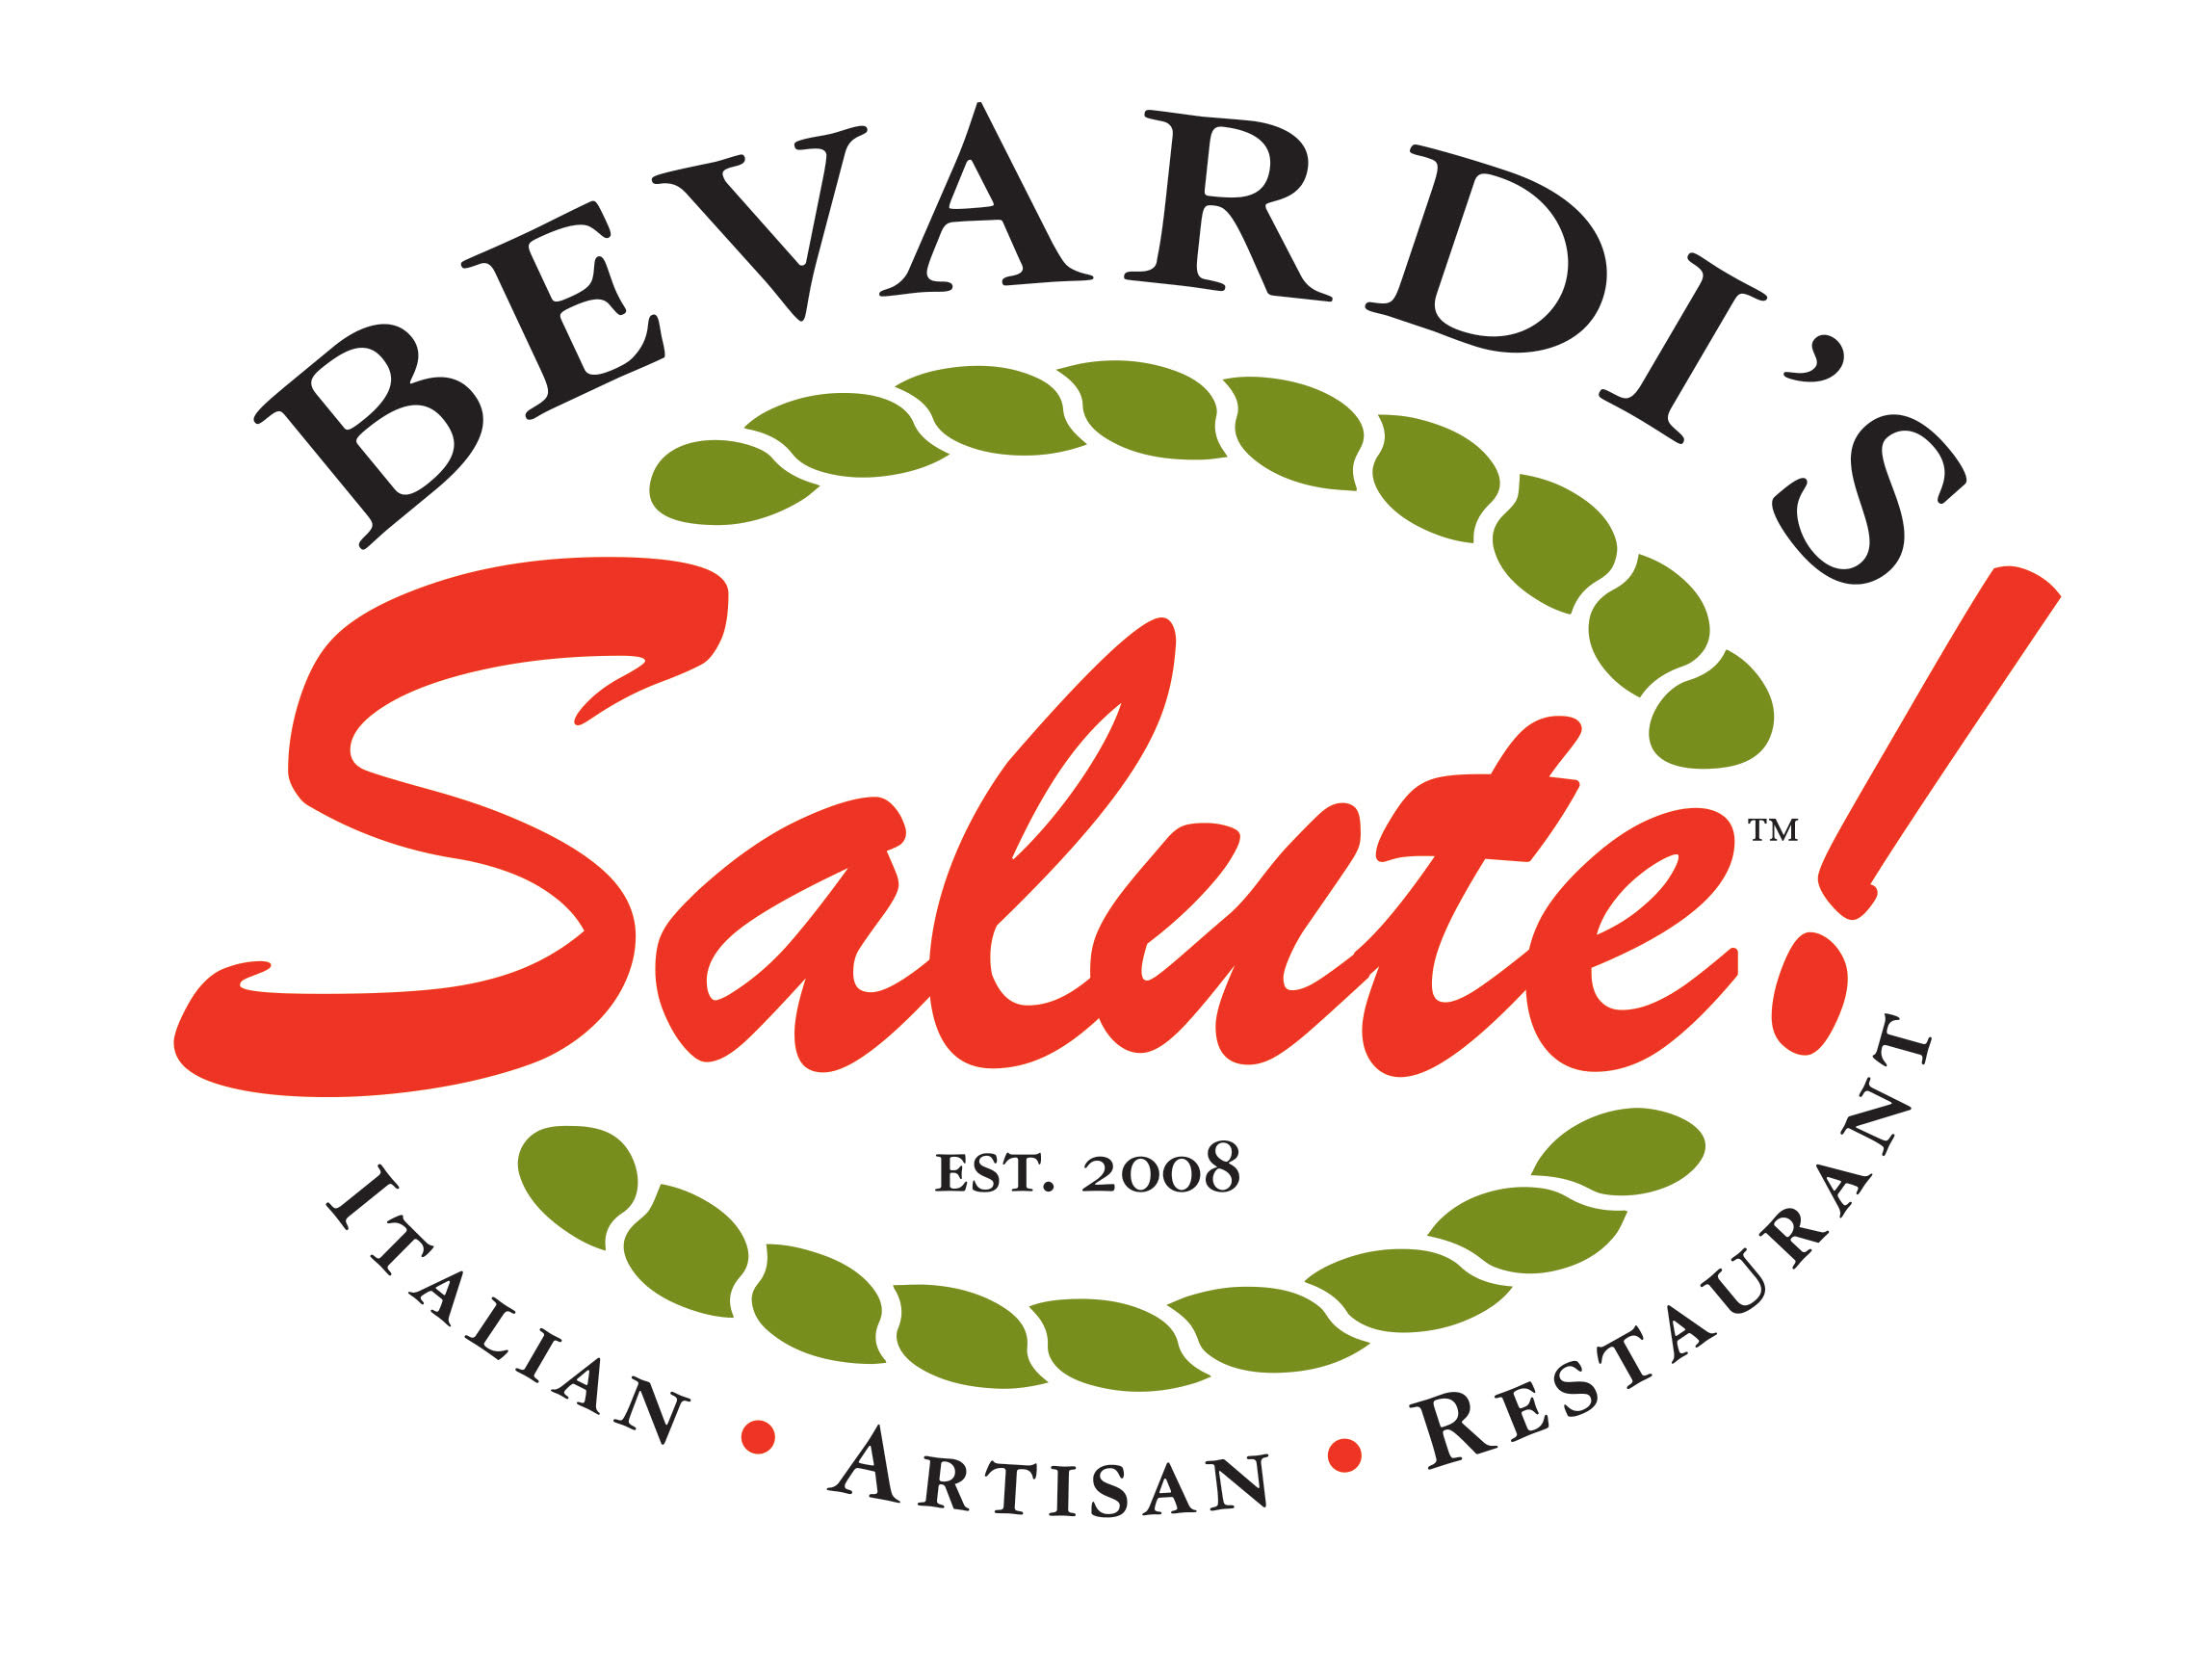 Savor Sarasota Extended at Bevardi's Salute! Restaurant